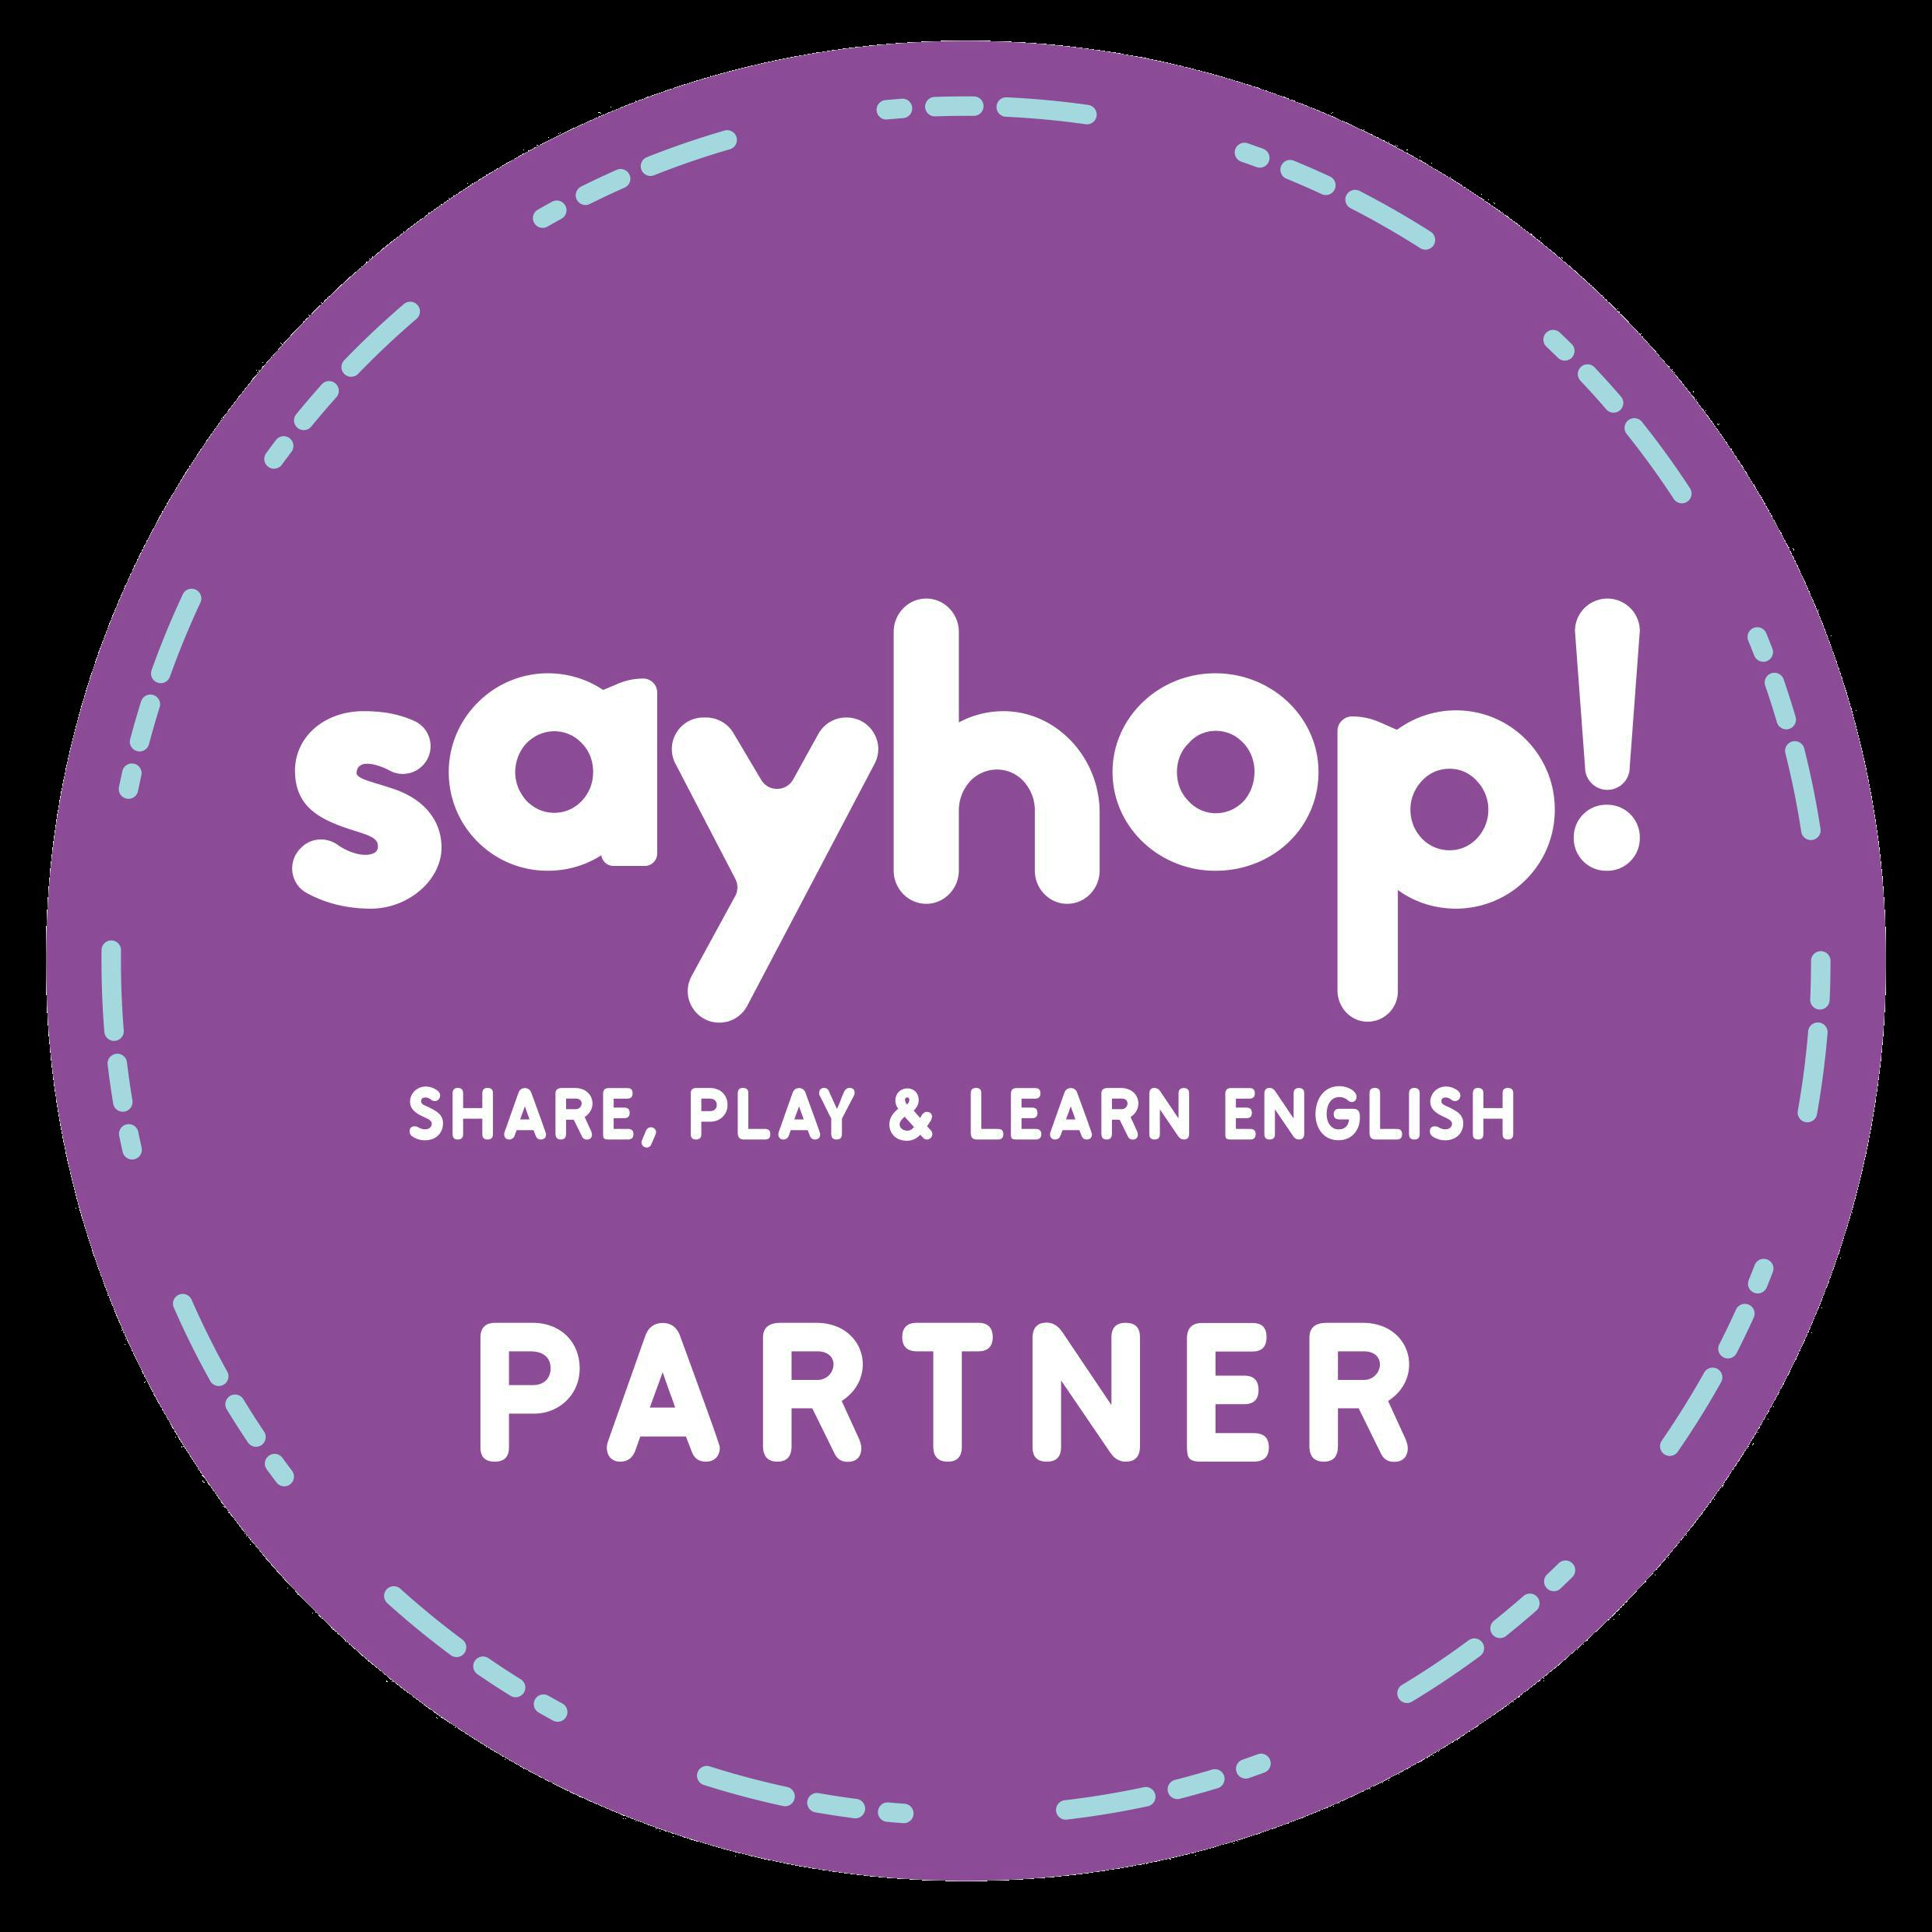 Partner Purple